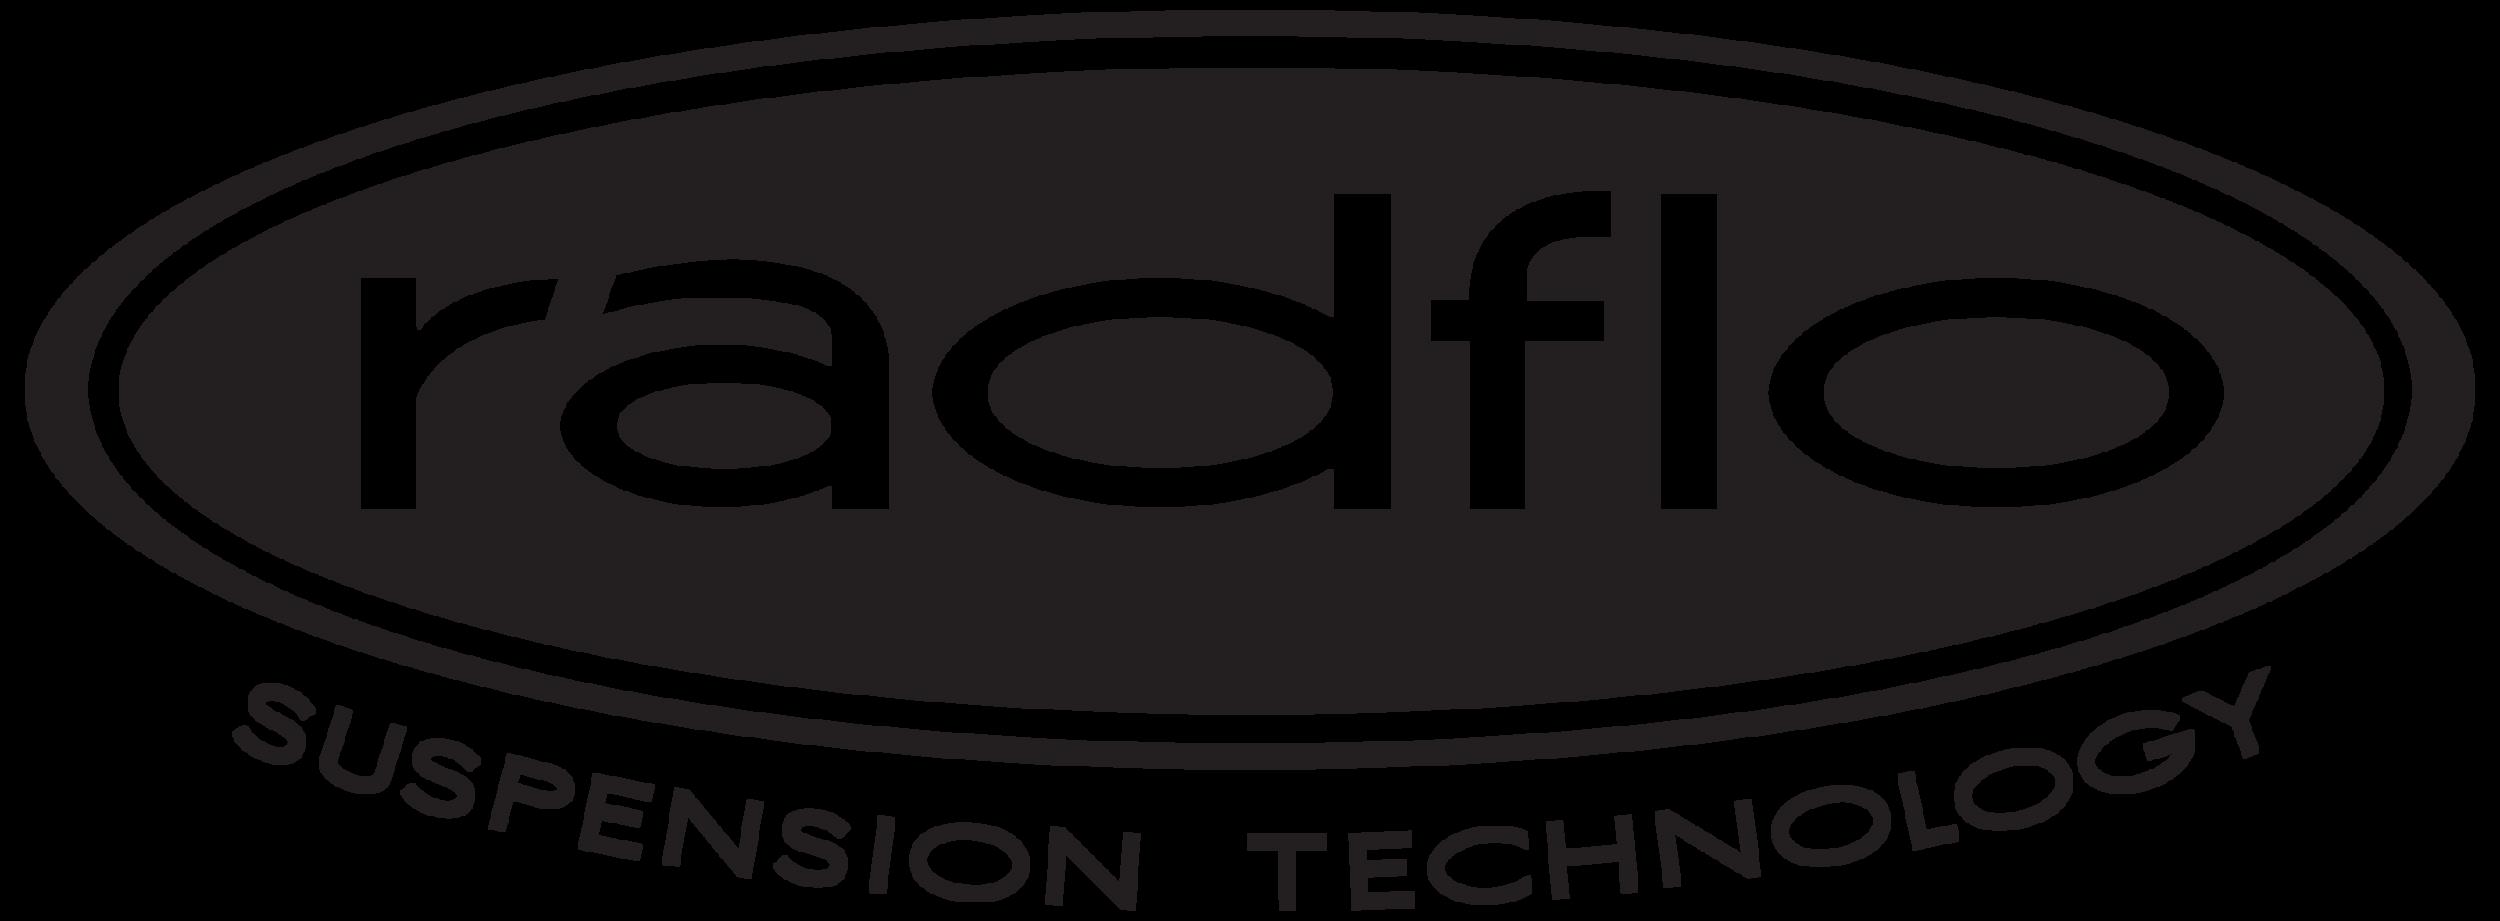 Radflo Logo Update-Transparent Bkgnd 9.5x3.5-300d.png